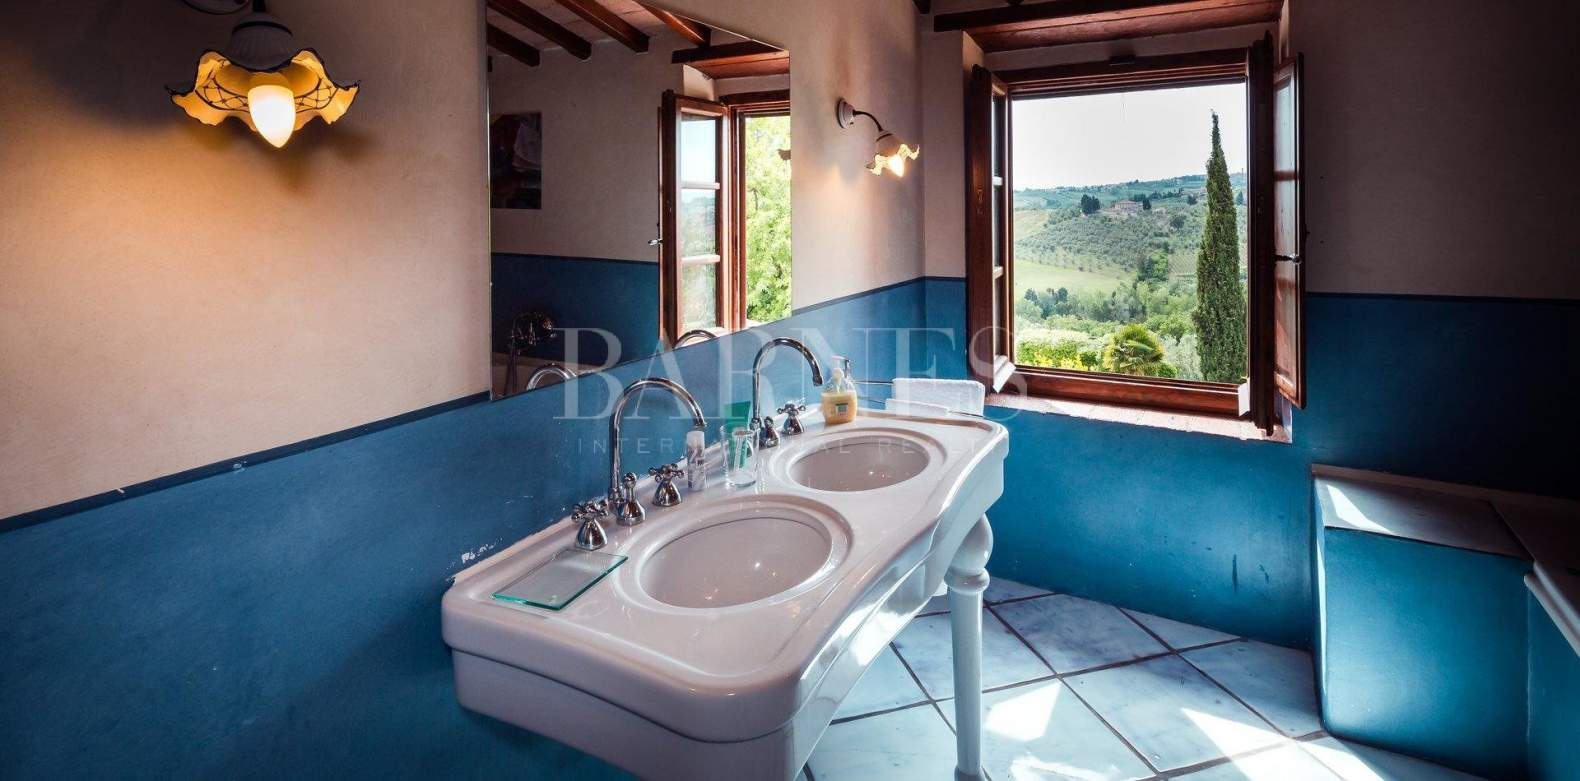 Barberino Tavarnelle  - Villa 10 Cuartos 9 Habitaciones - picture 13